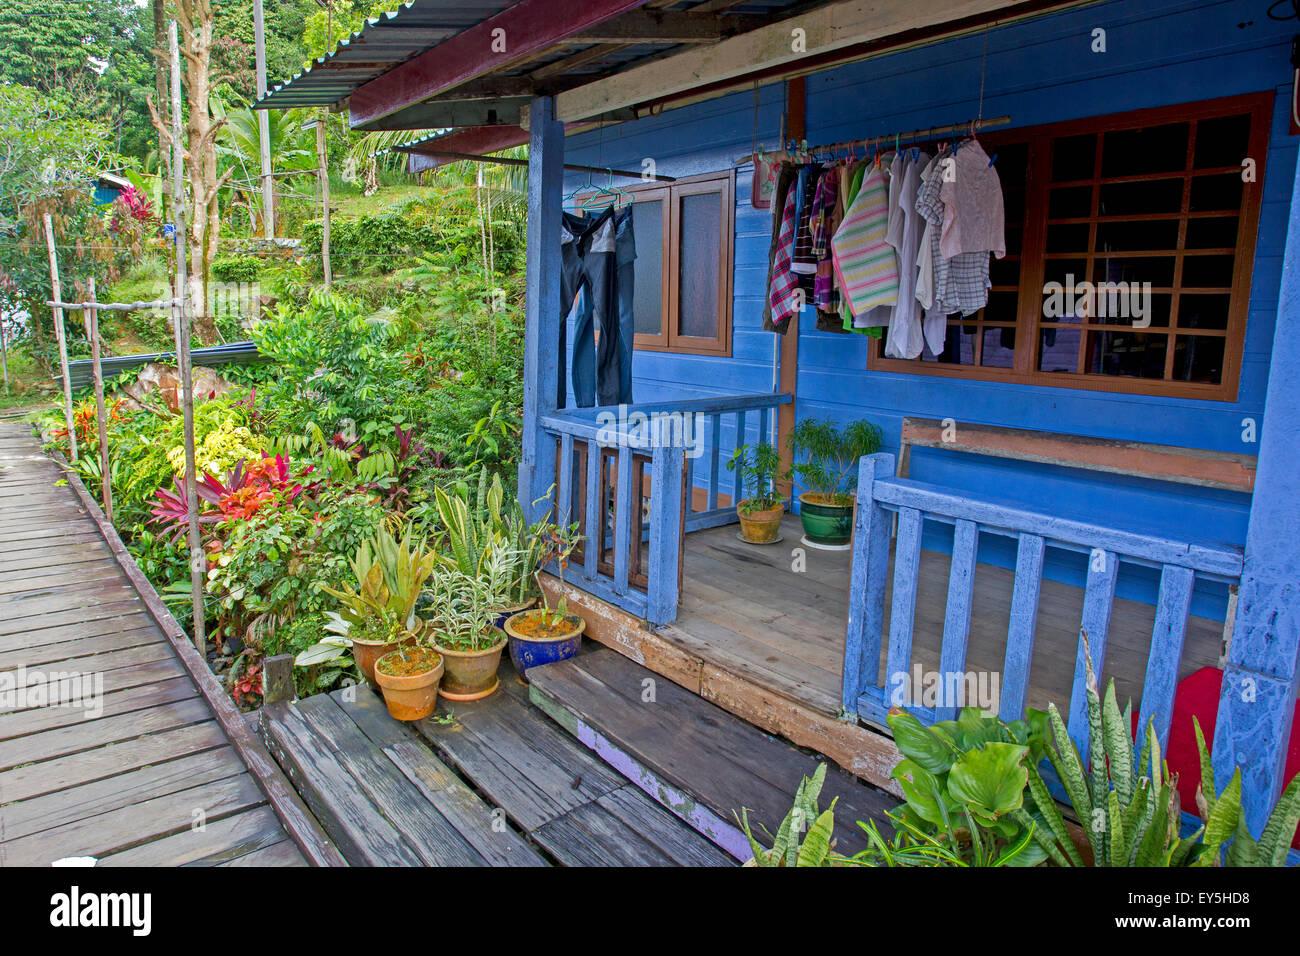 Fishing village at the edge of Salak River - Sarawak Borneo - Stock Image